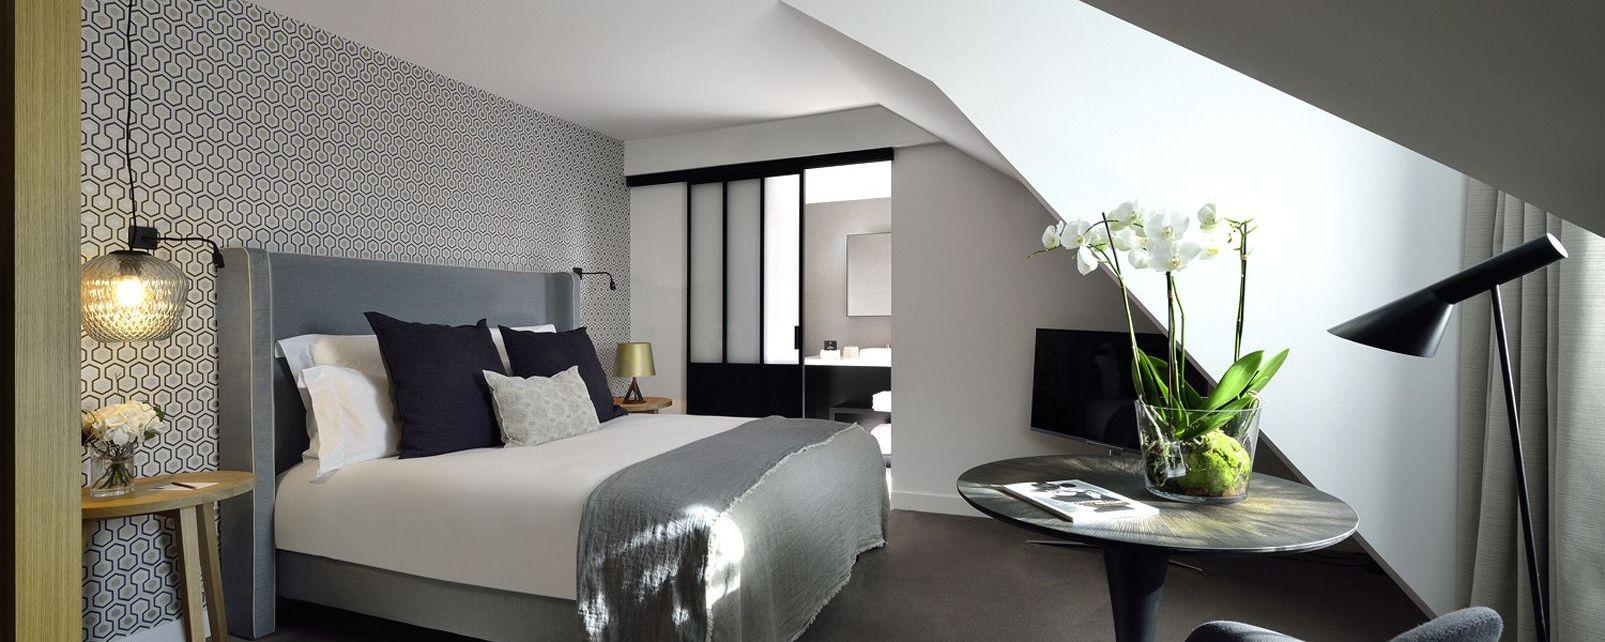 H tel balthazar spa for Hotel balthazar